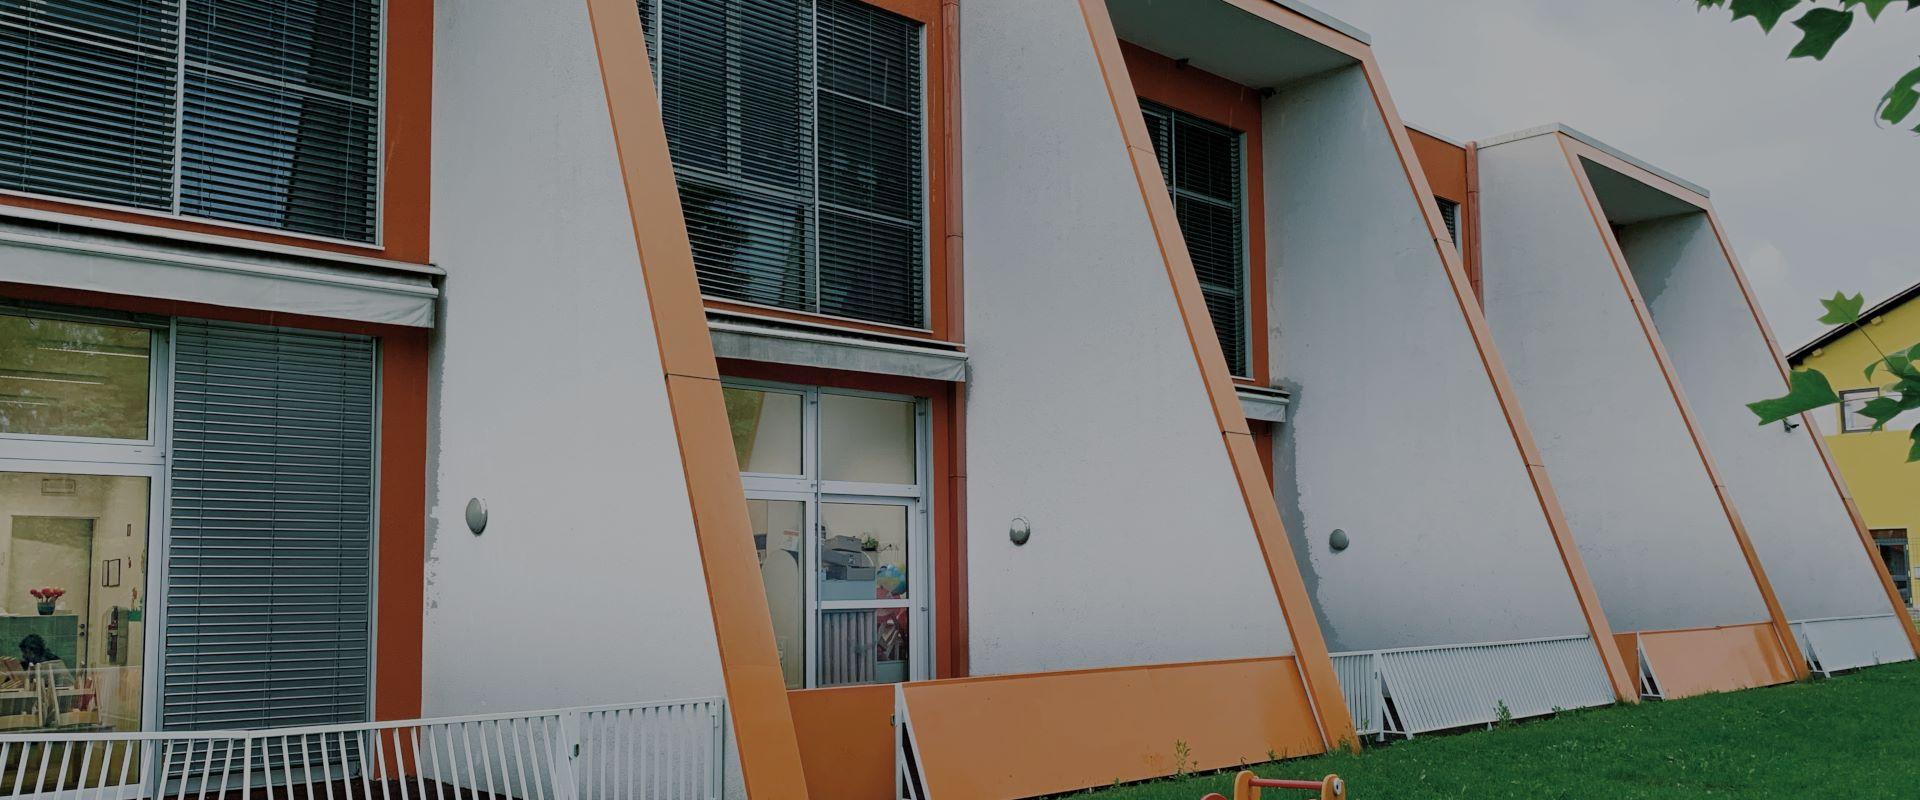 Zarja Kindergarten from the back